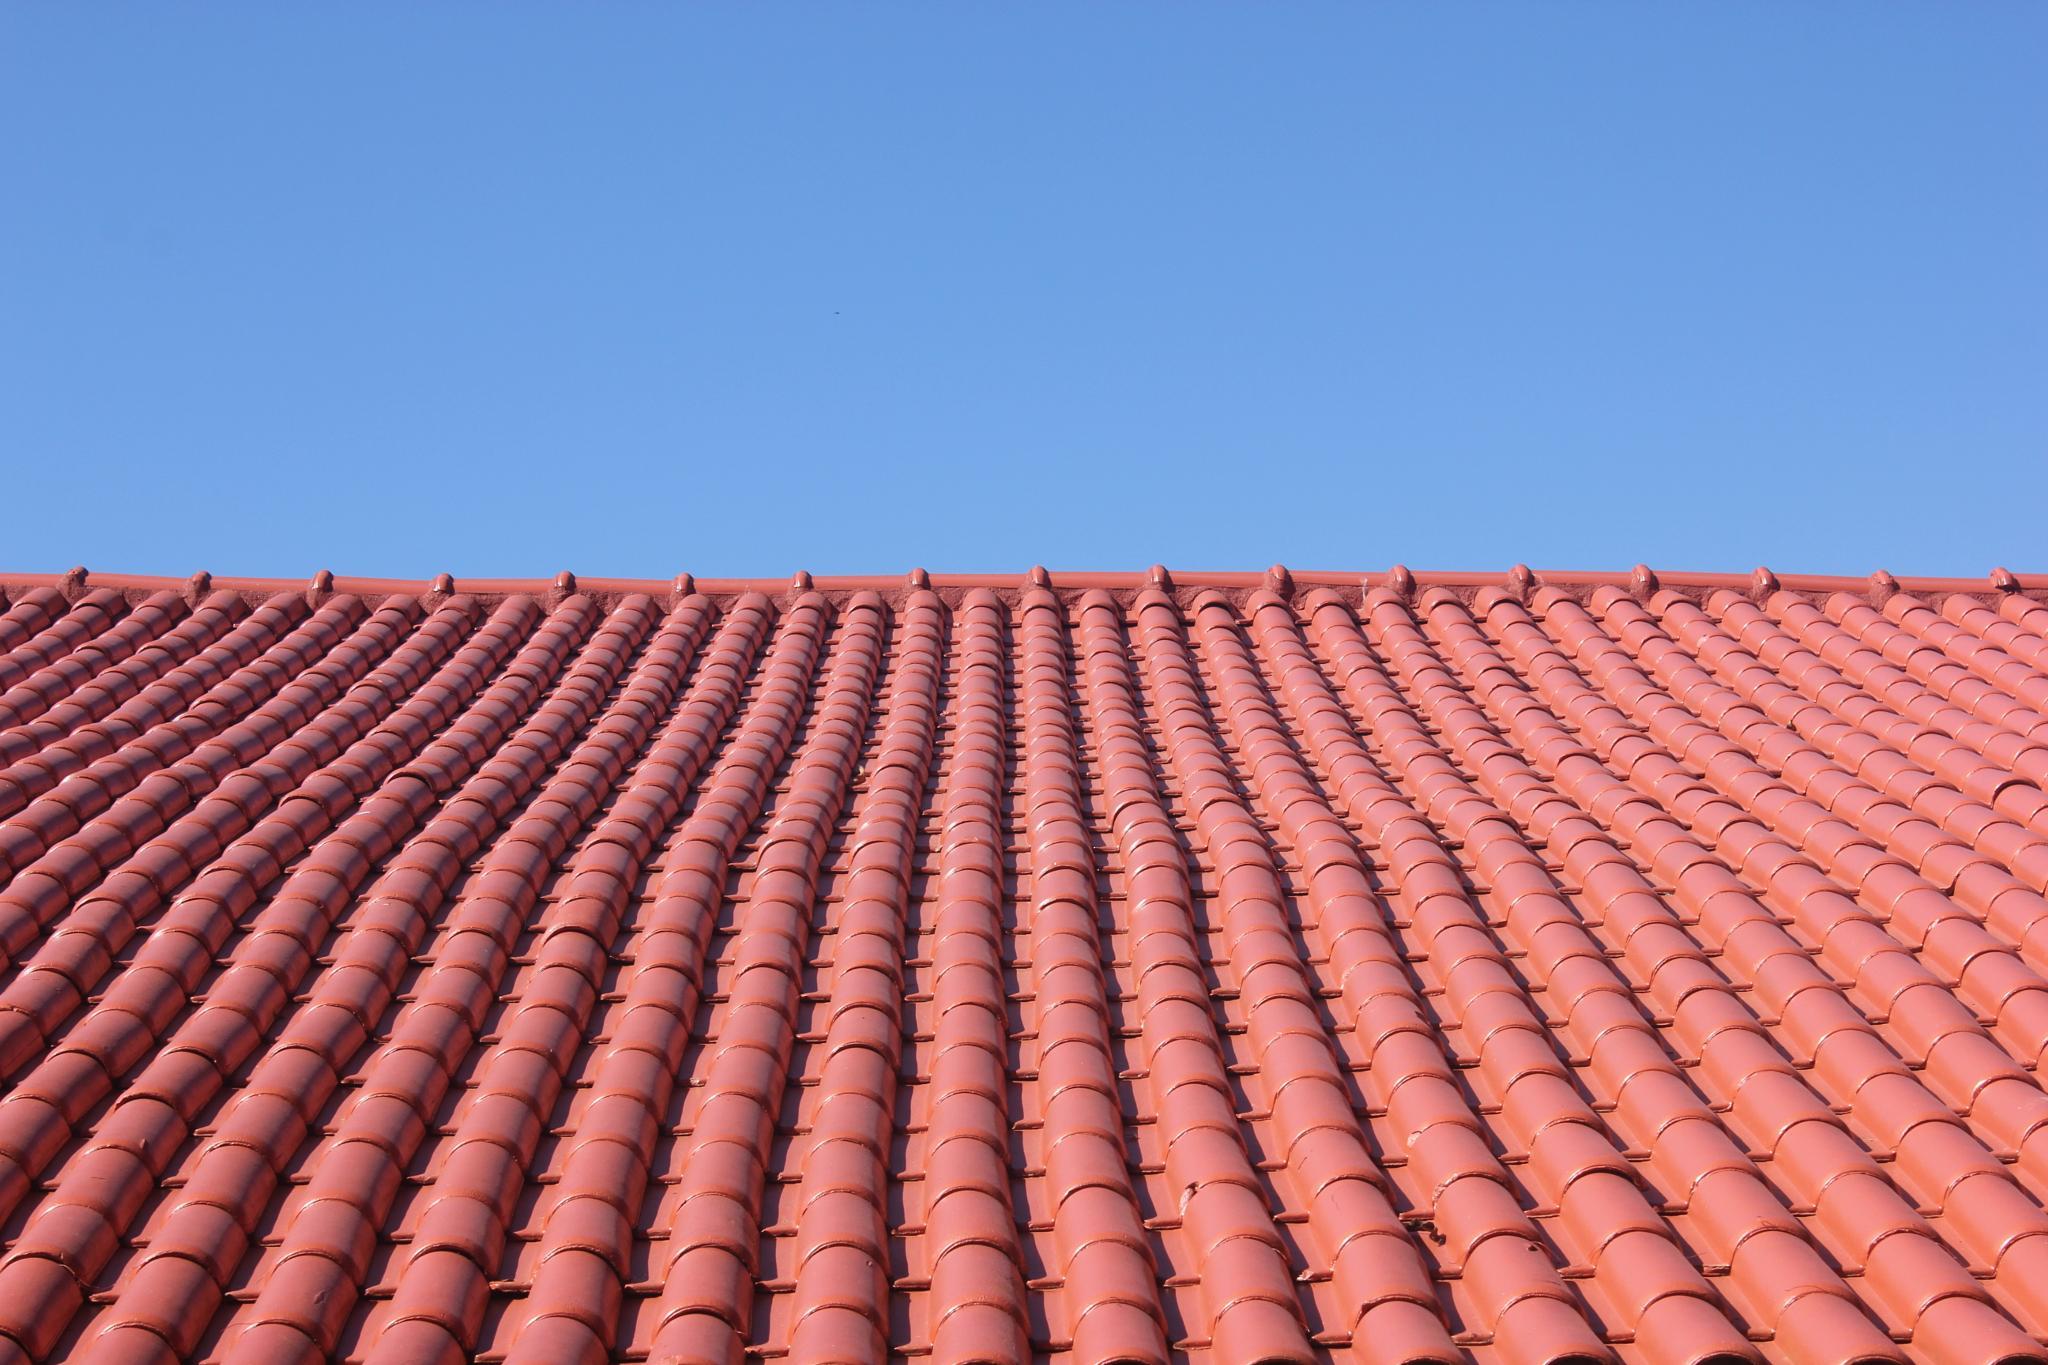 Roof by Ricardo Pacheco